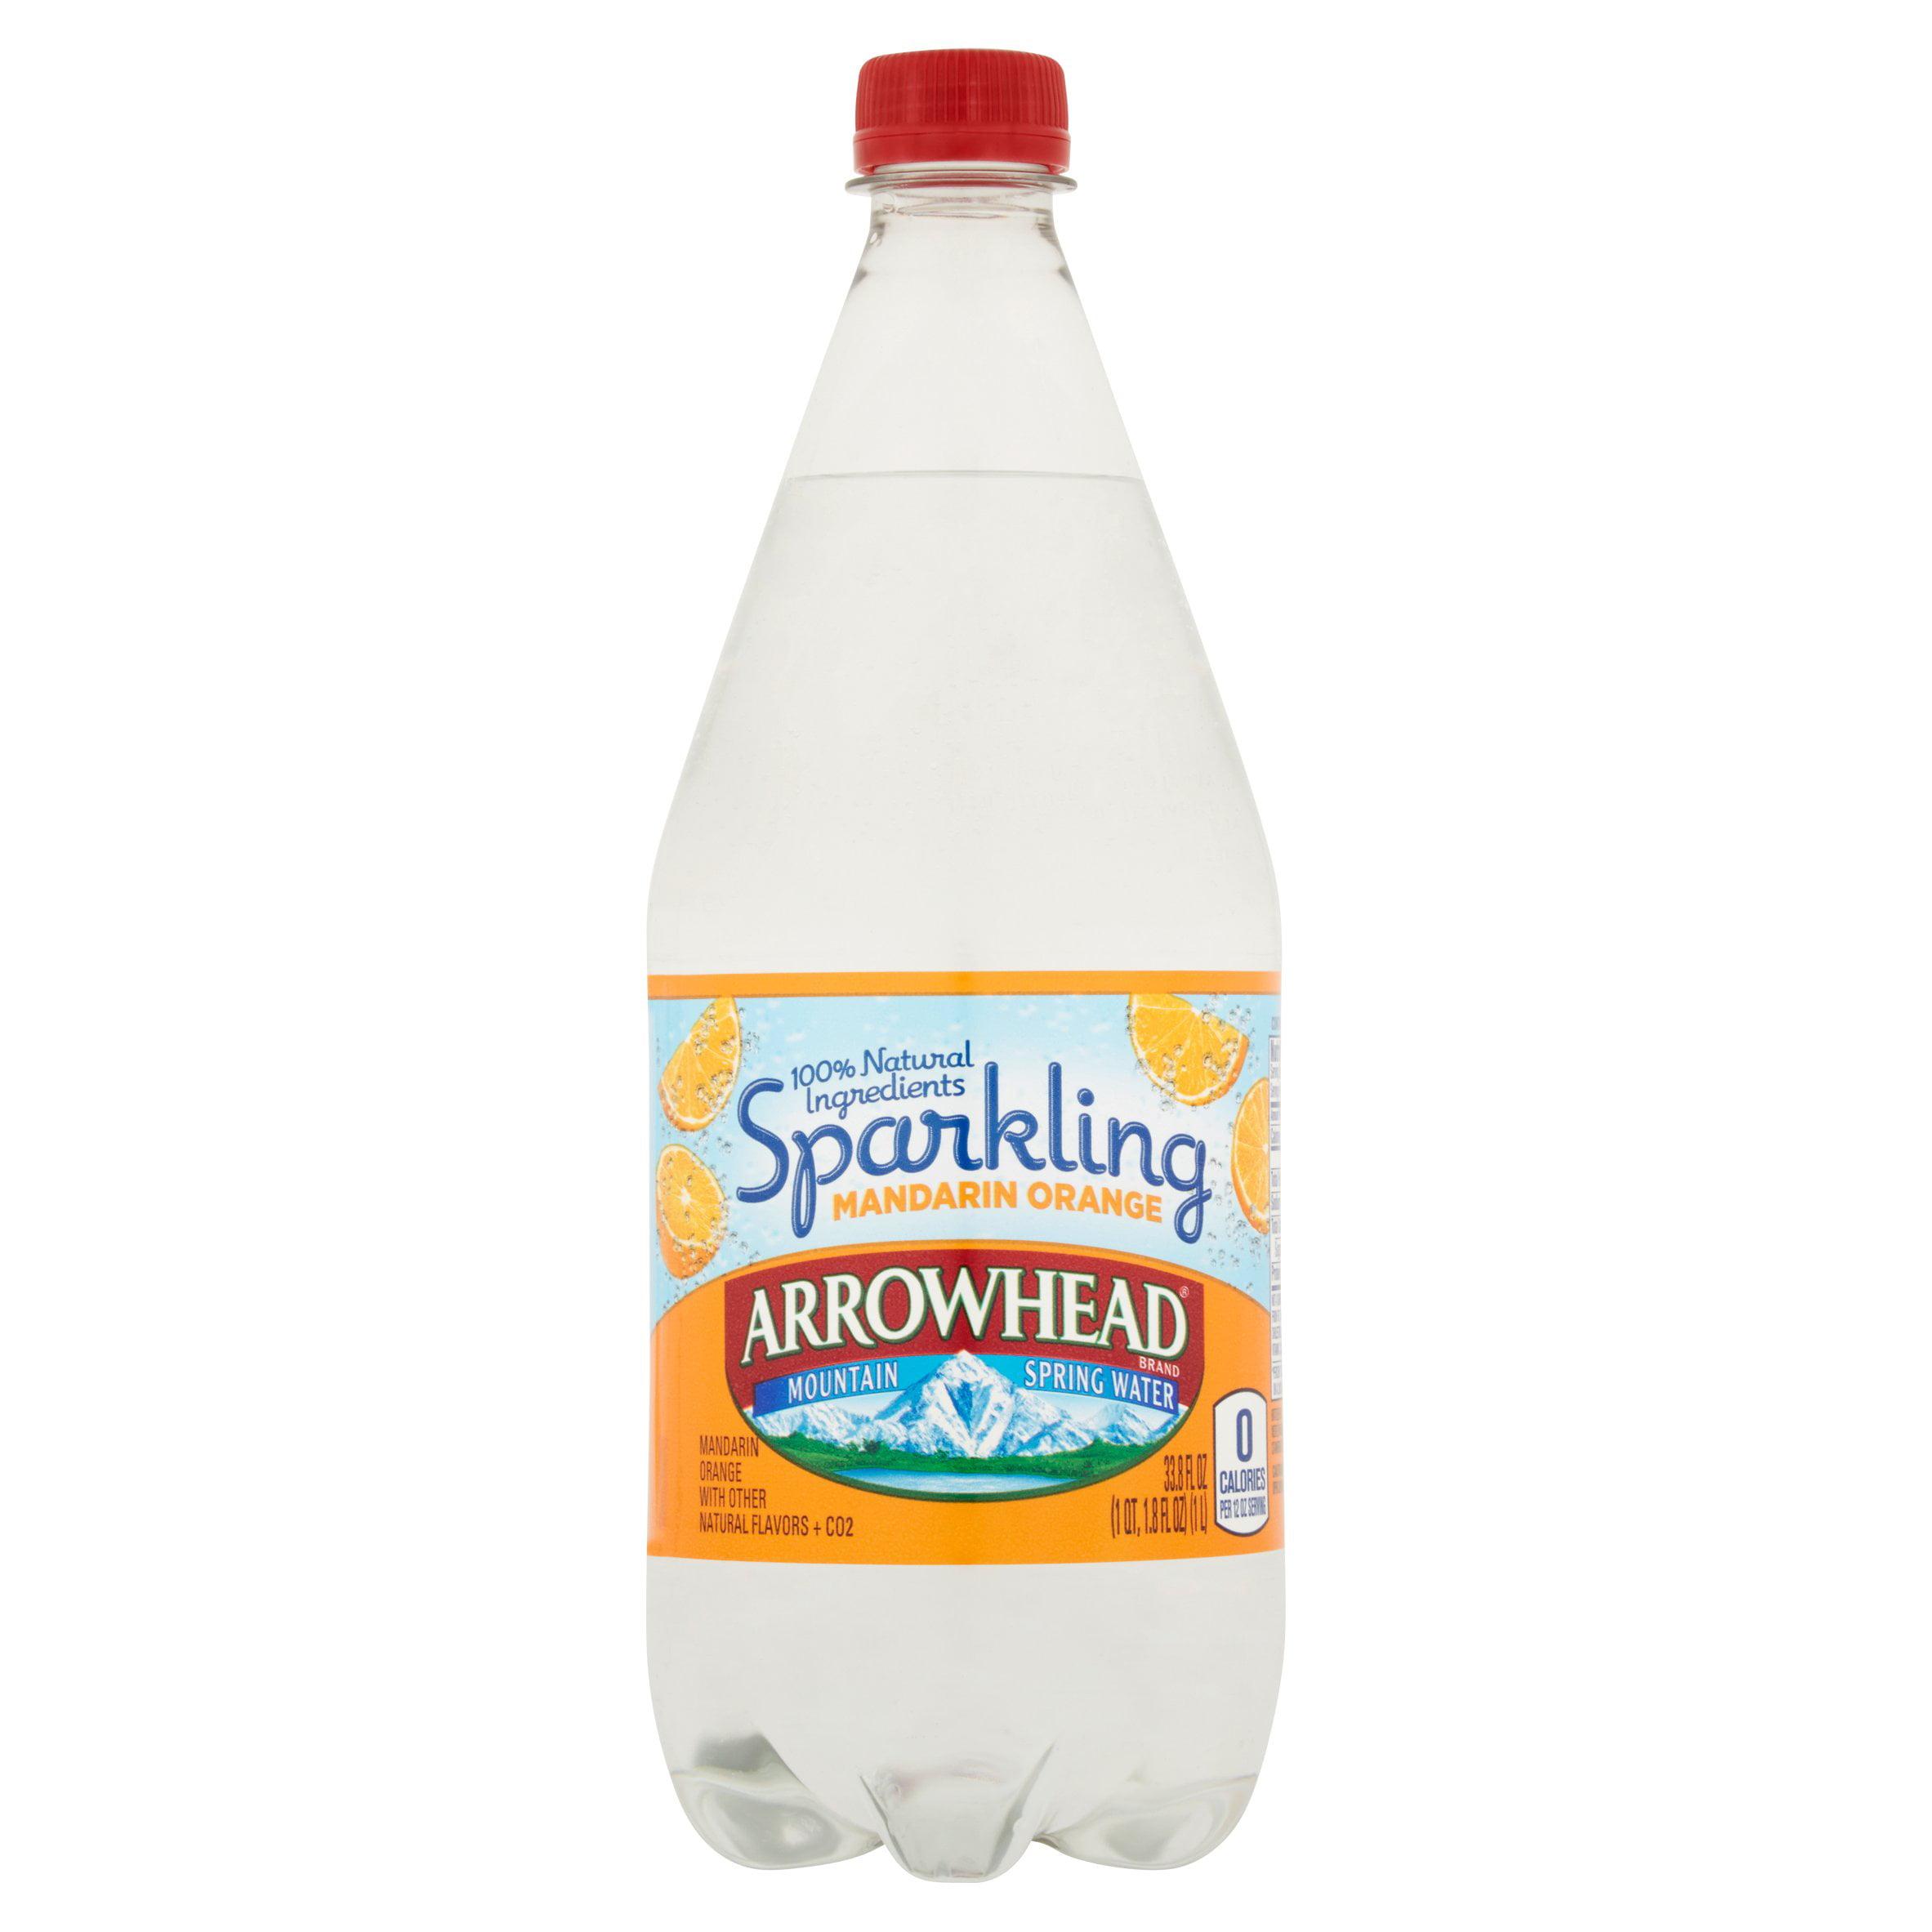 ArrowHead Sparkling Mandarin Orange Mountain Spring Water 33.8fl oz by Nestlé Waters North America Inc.